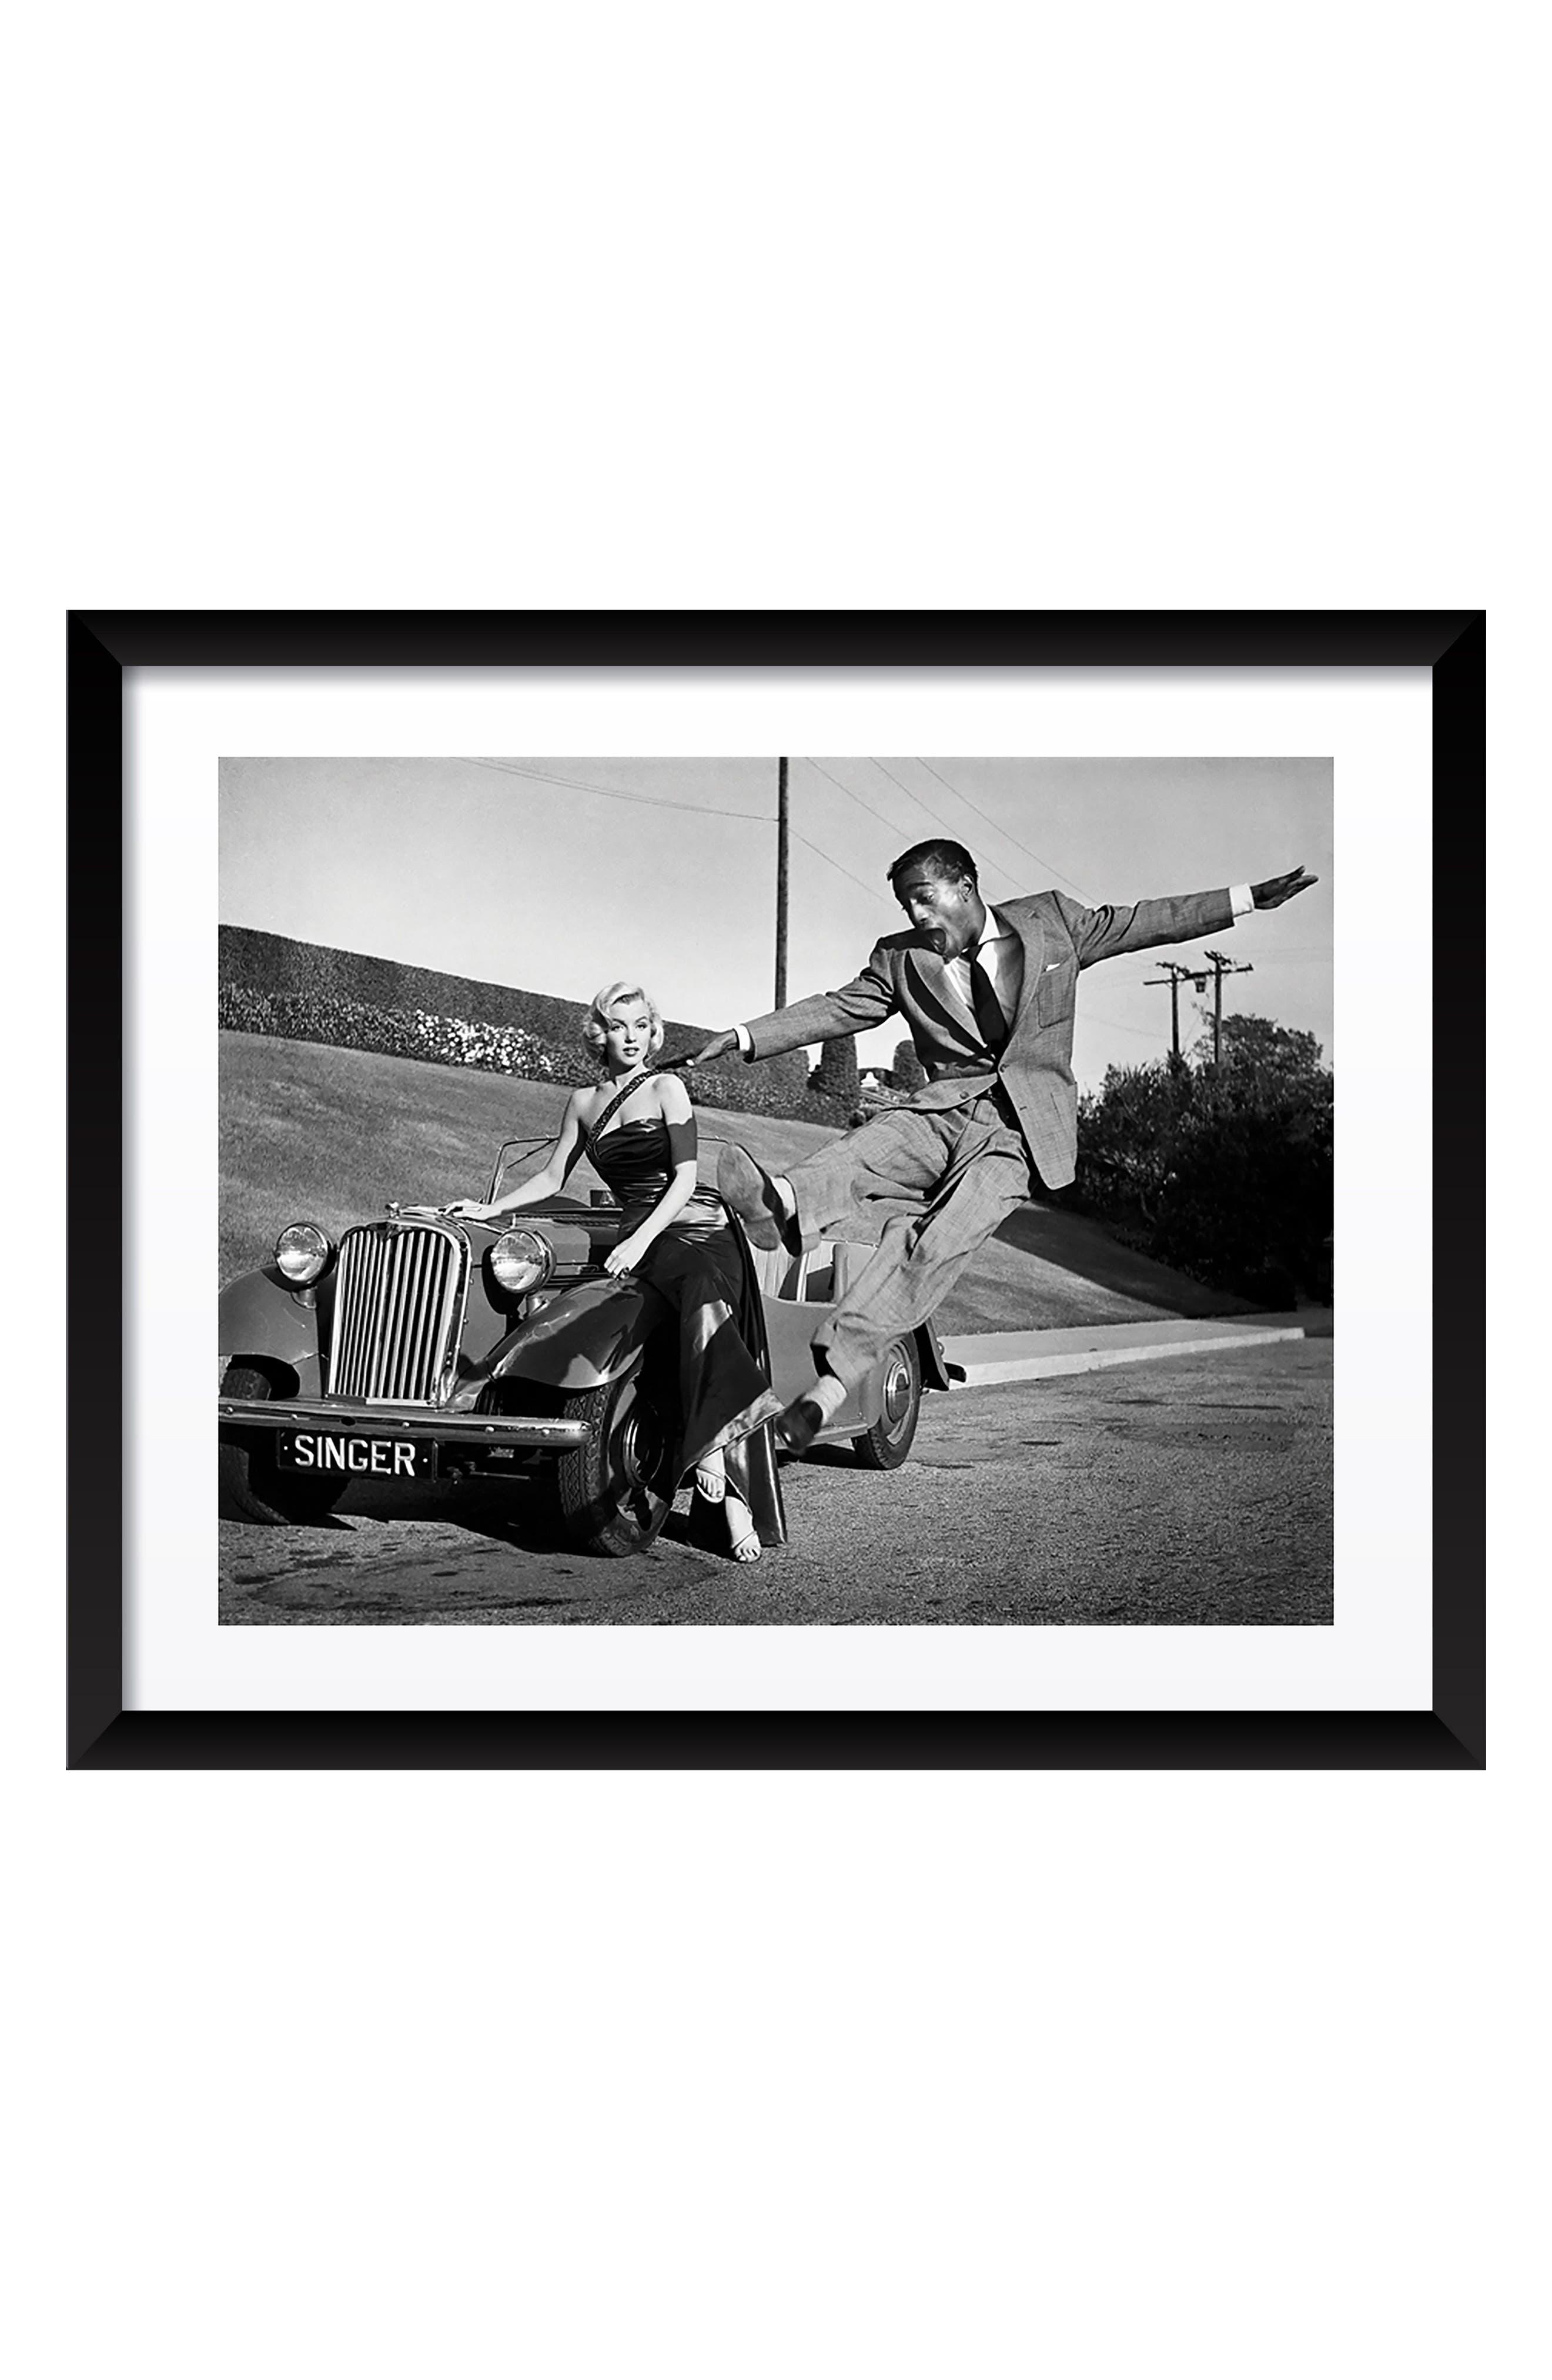 Alternate Image 1 Selected - Artography Limited Marilyn Monroe & Sammy Davis Jr. Fine Art Print